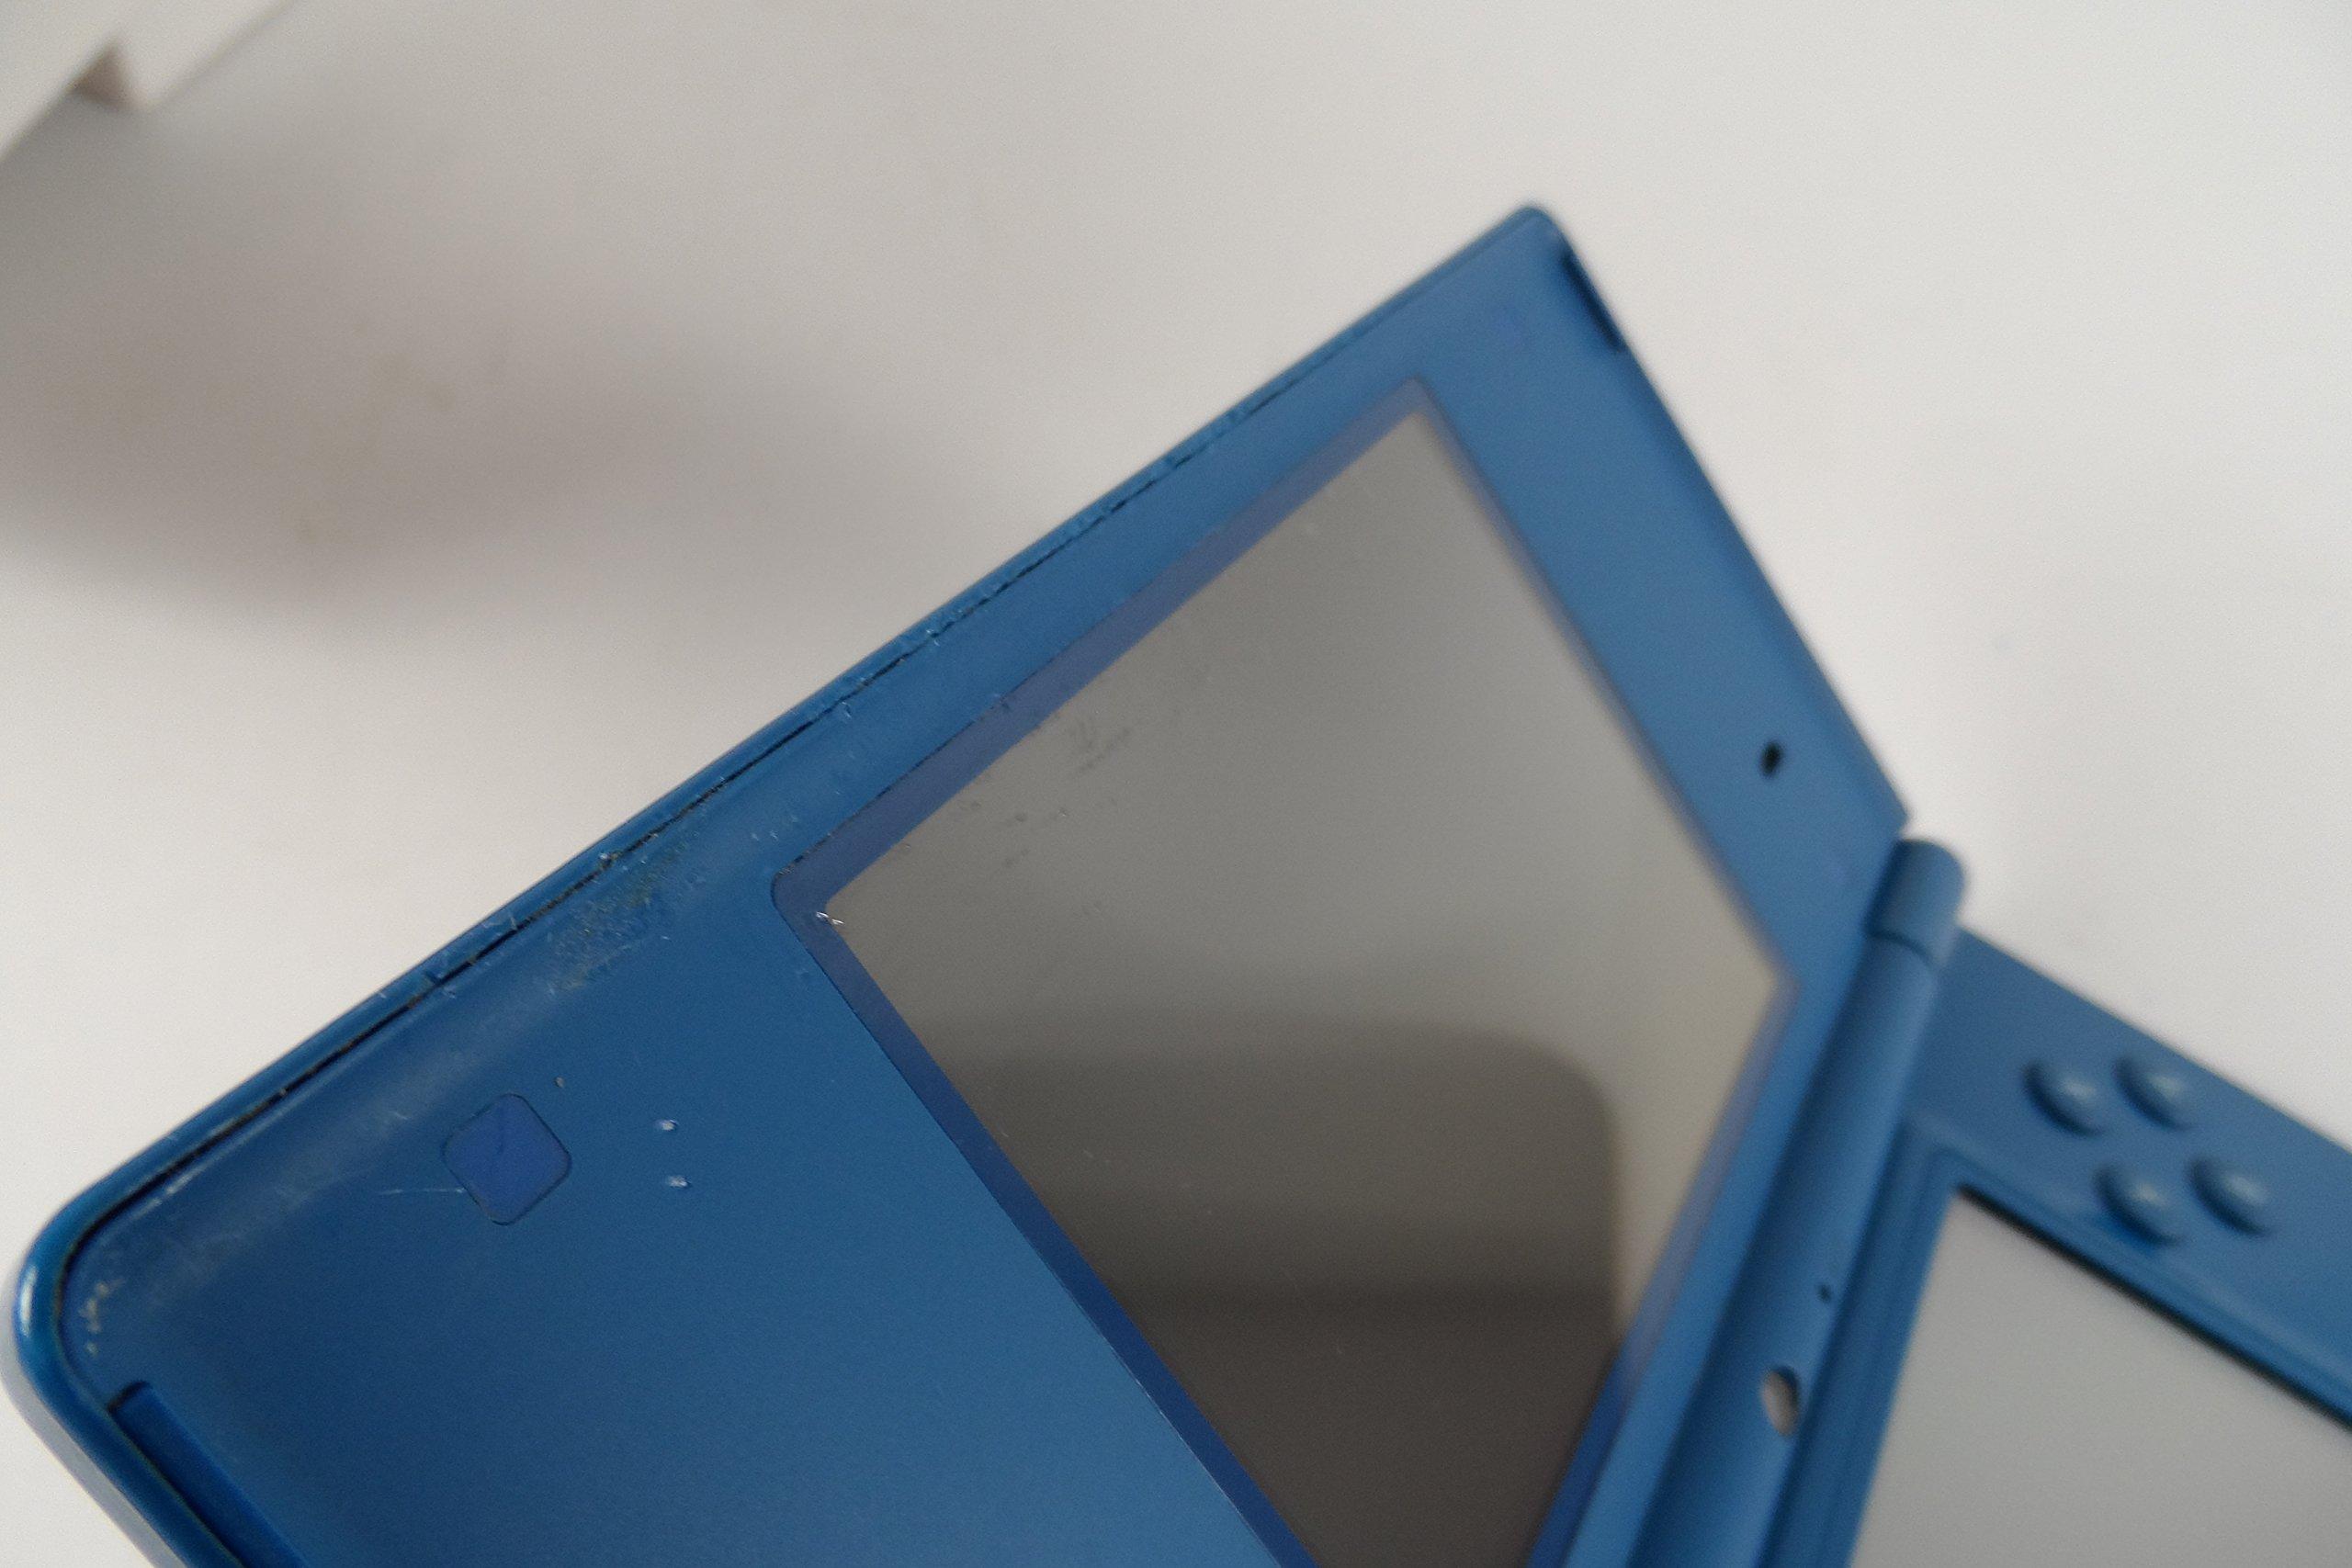 Nintendo DSi 3.25'' LCD Display Game System - Matte Blue by Nintendo (Image #3)